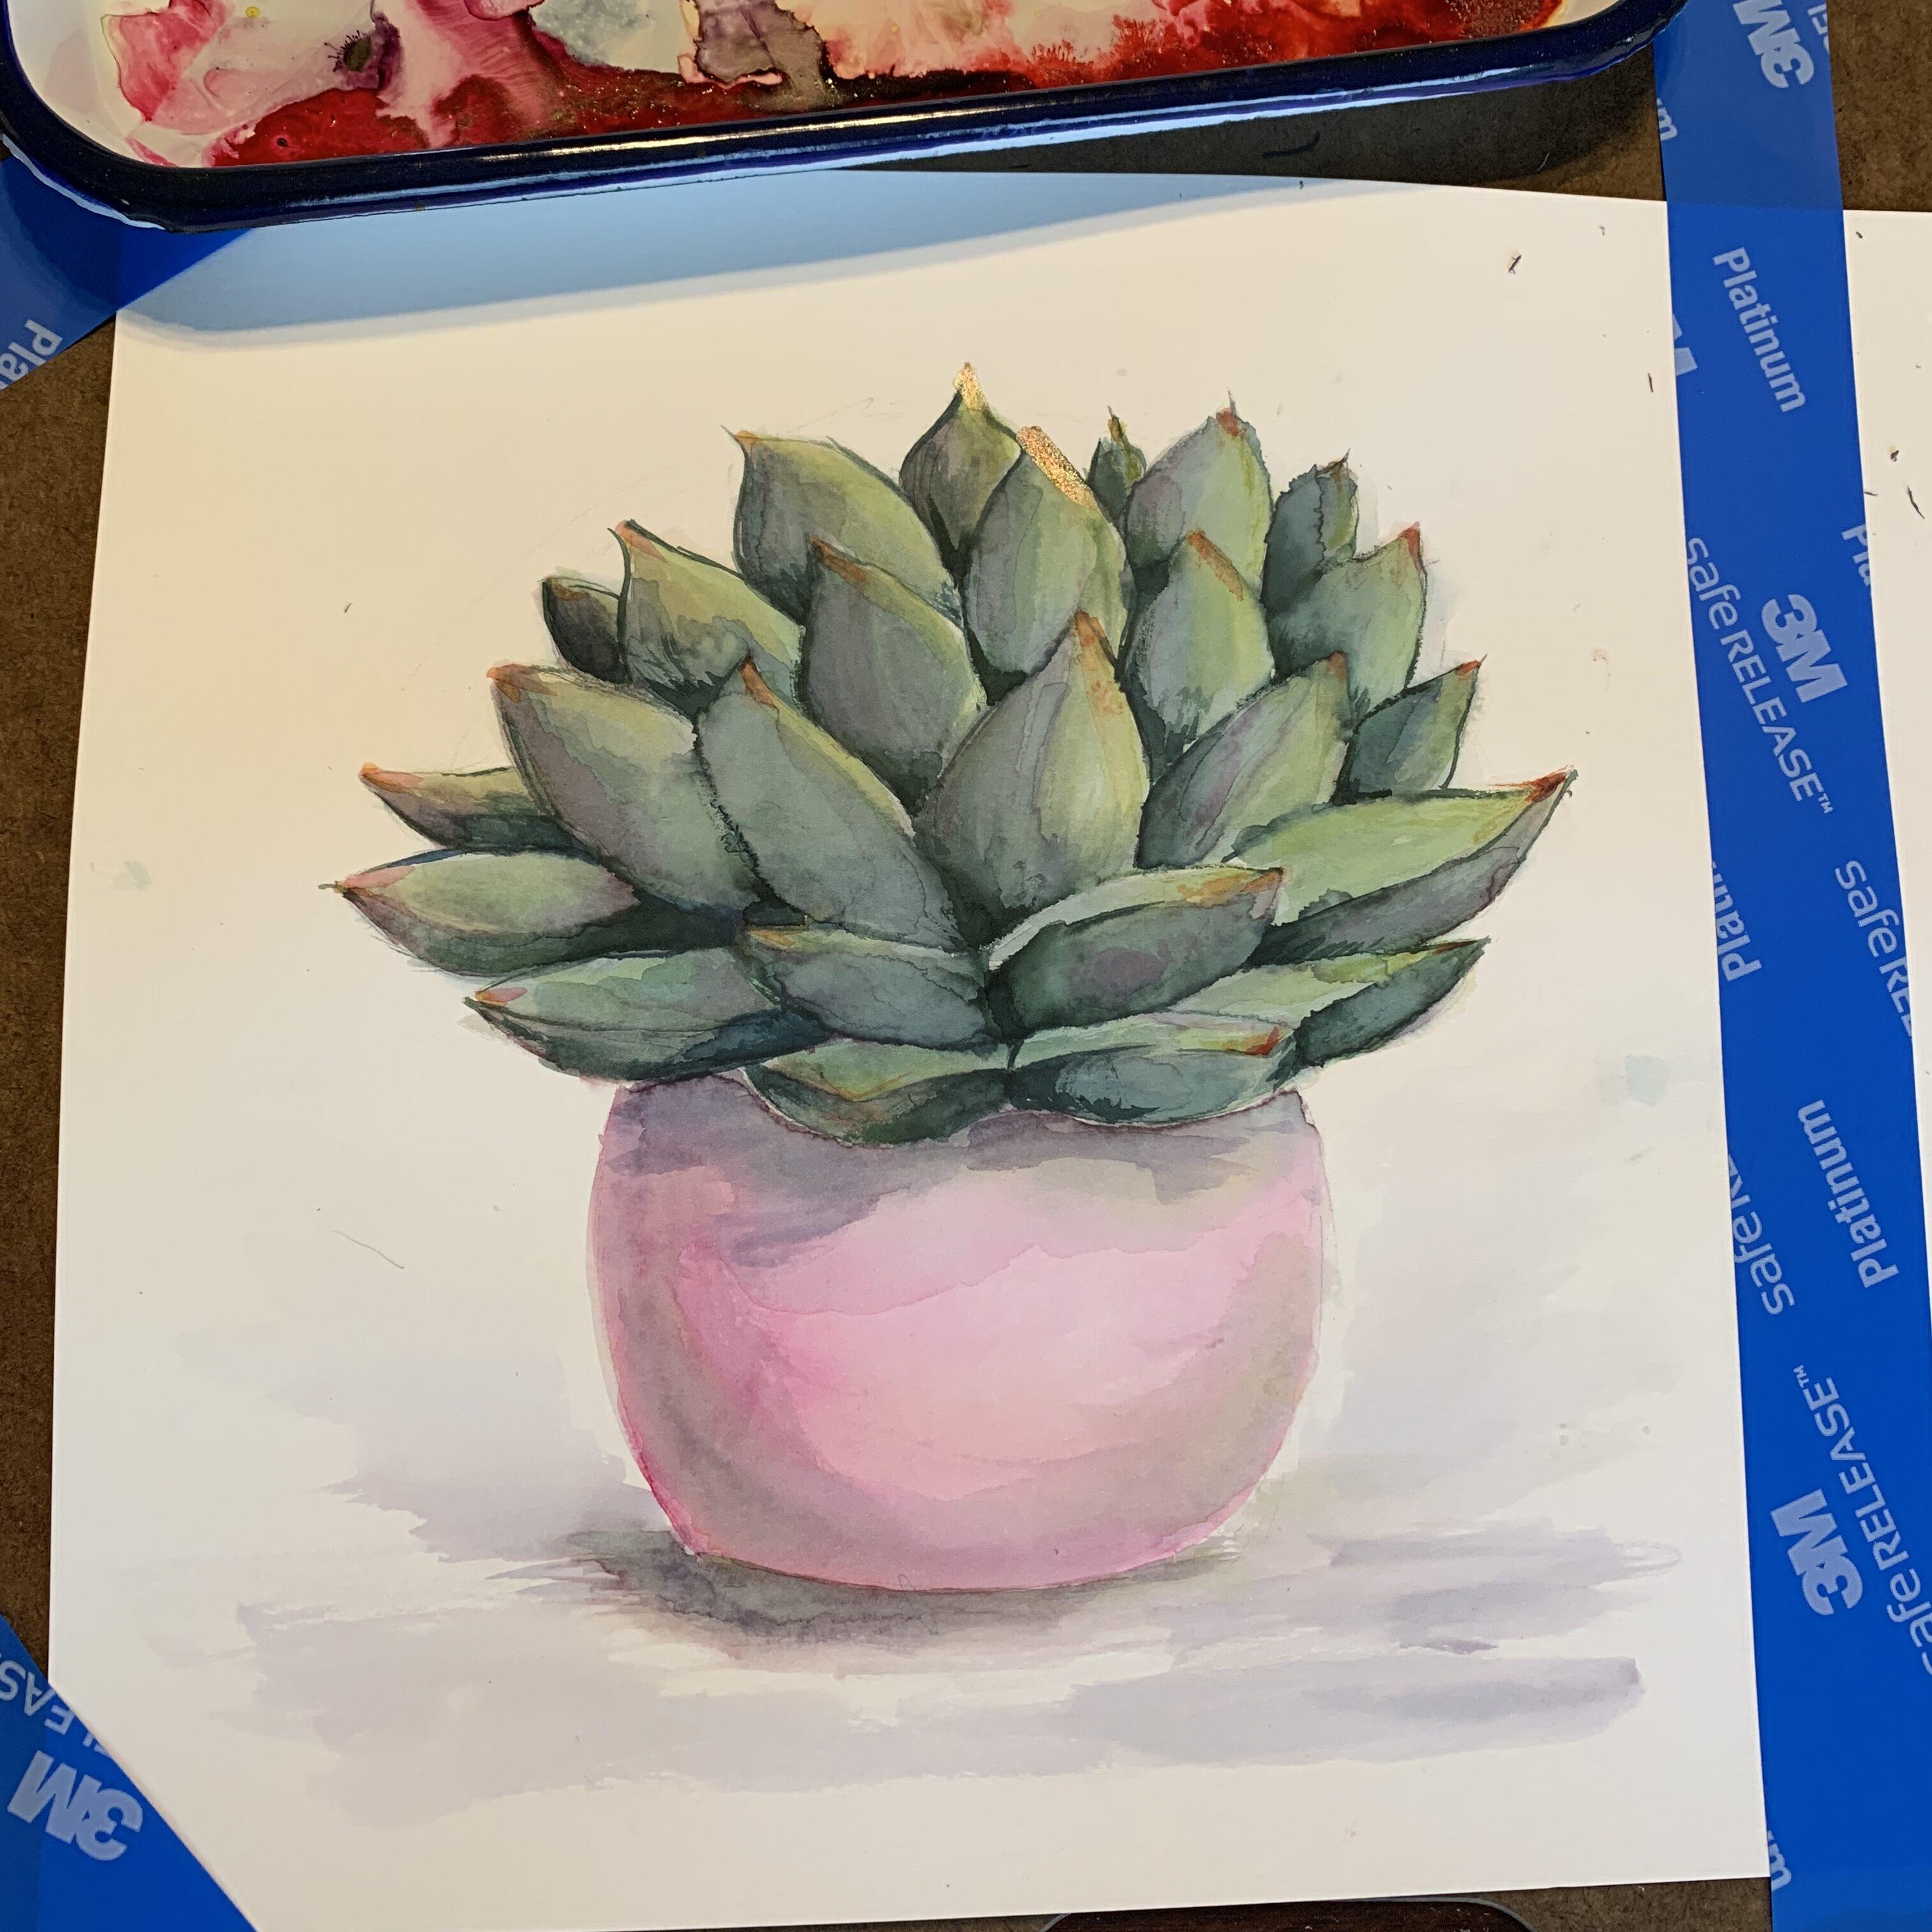 DB02B591 3E8F 4745 847B 0B267EC32762 Succulent in a pink pot